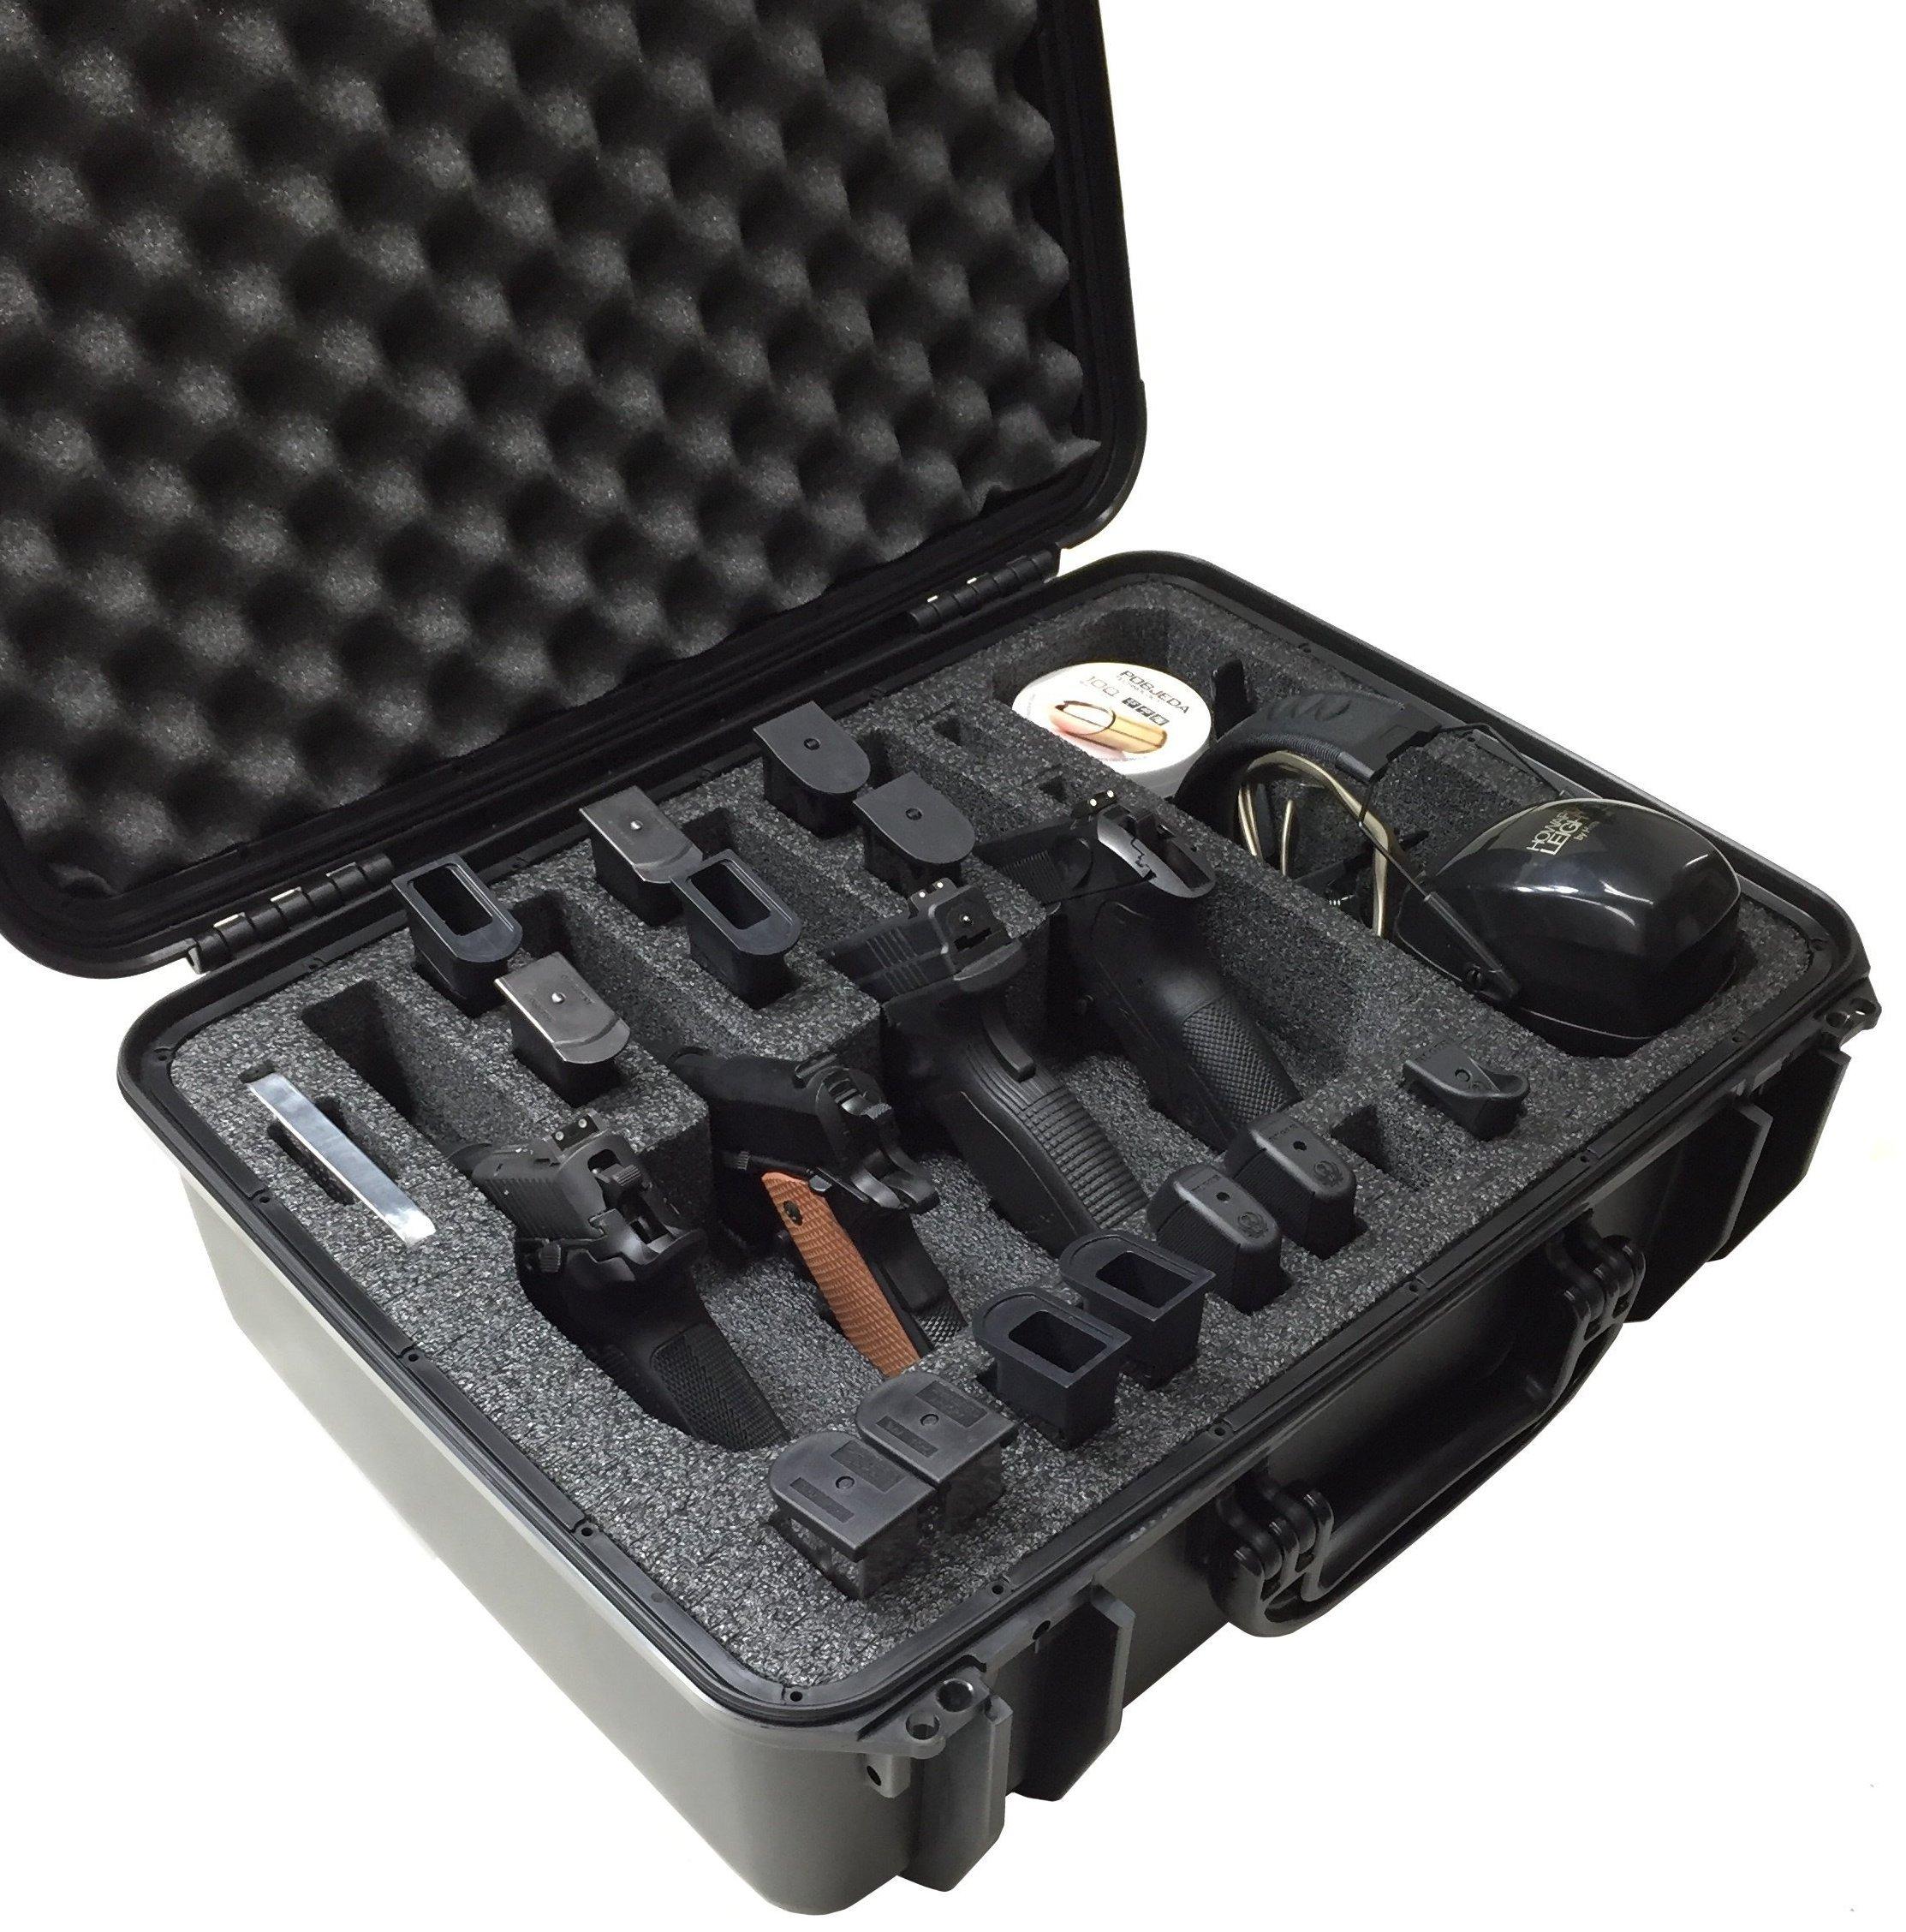 Case Club Waterproof 4 Pistol Case with Accessory Pocket & Silica Gel to Help Prevent Gun Rust